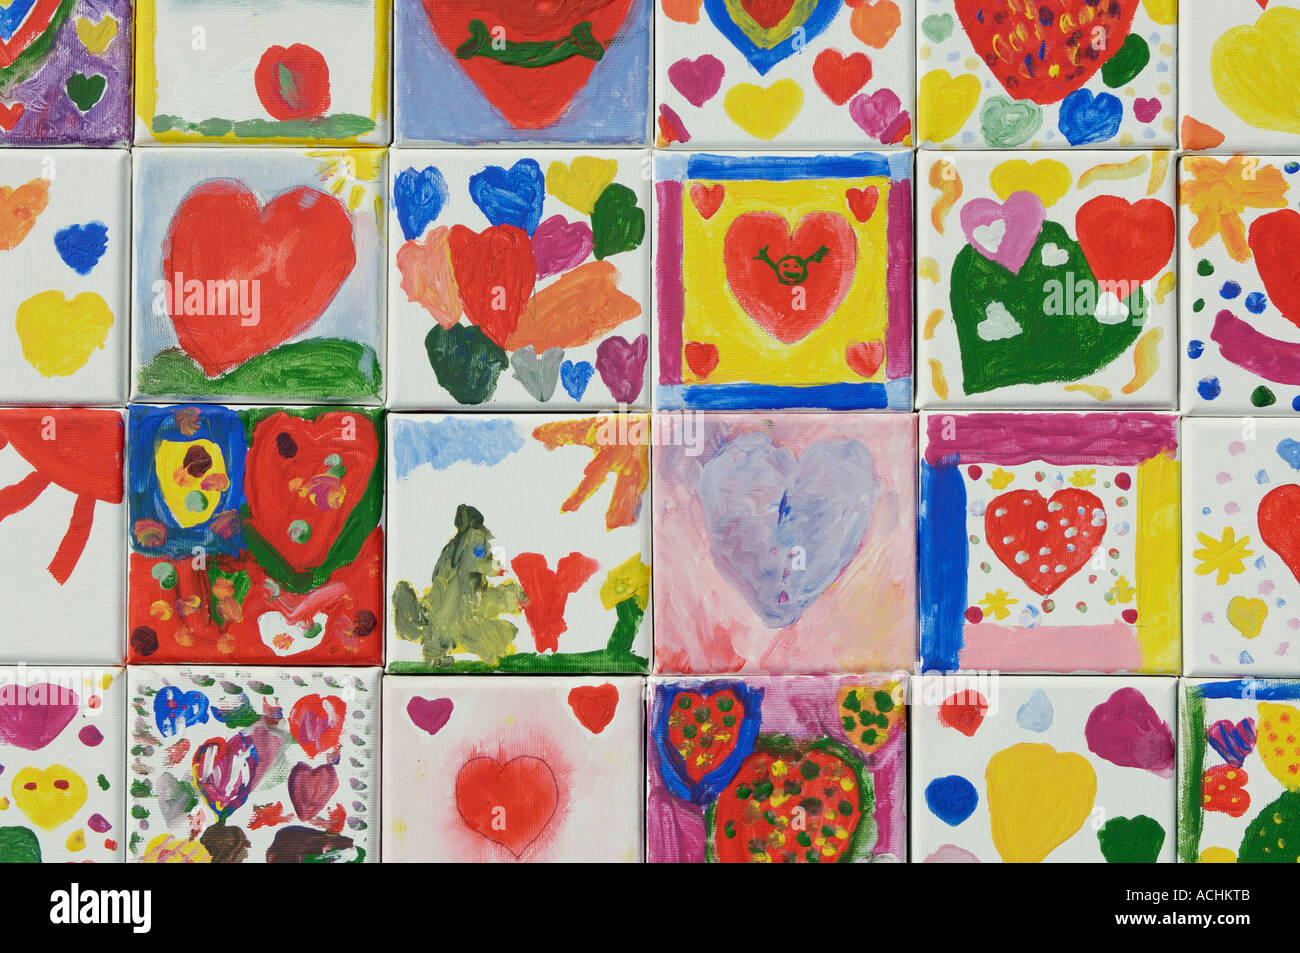 Childrens Pictures Stockfotos & Childrens Pictures Bilder - Alamy